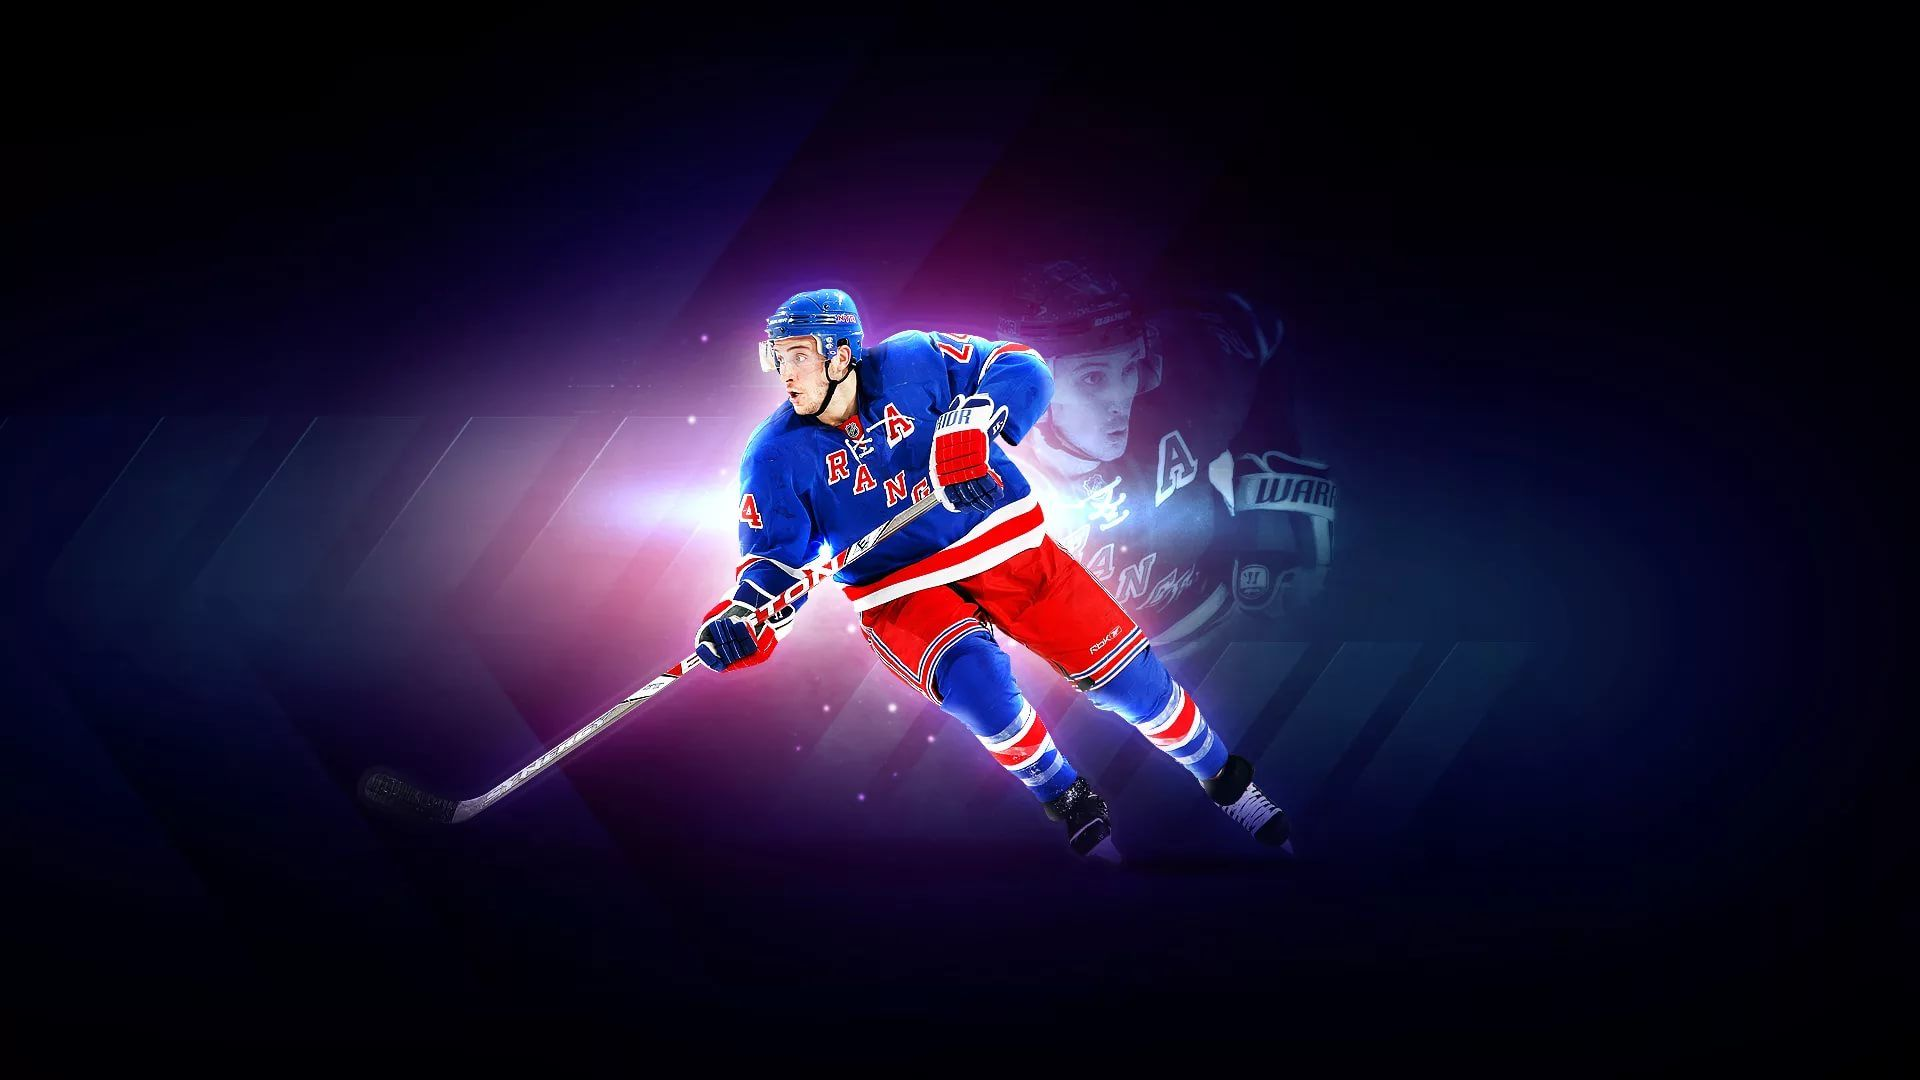 Ice Hockey 1920x1080 wallpaper